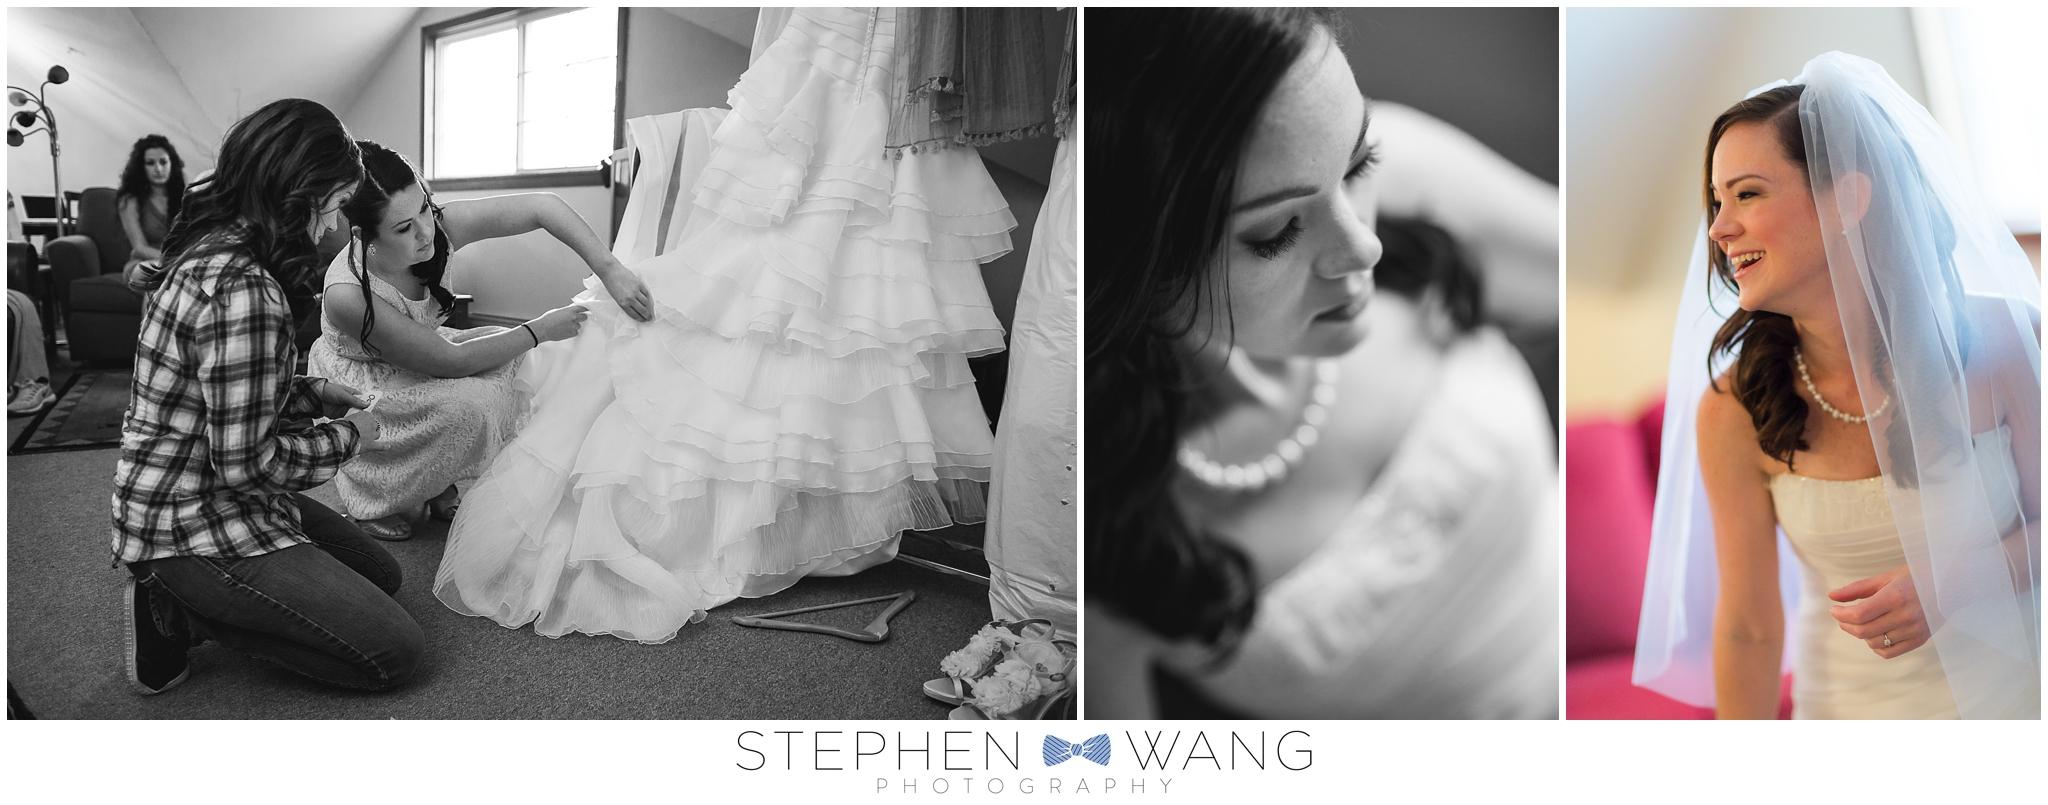 Stephen Wang Photography wedding connecticut deep river lace factory wedding photography connecticut photographer-01-22_0005.jpg